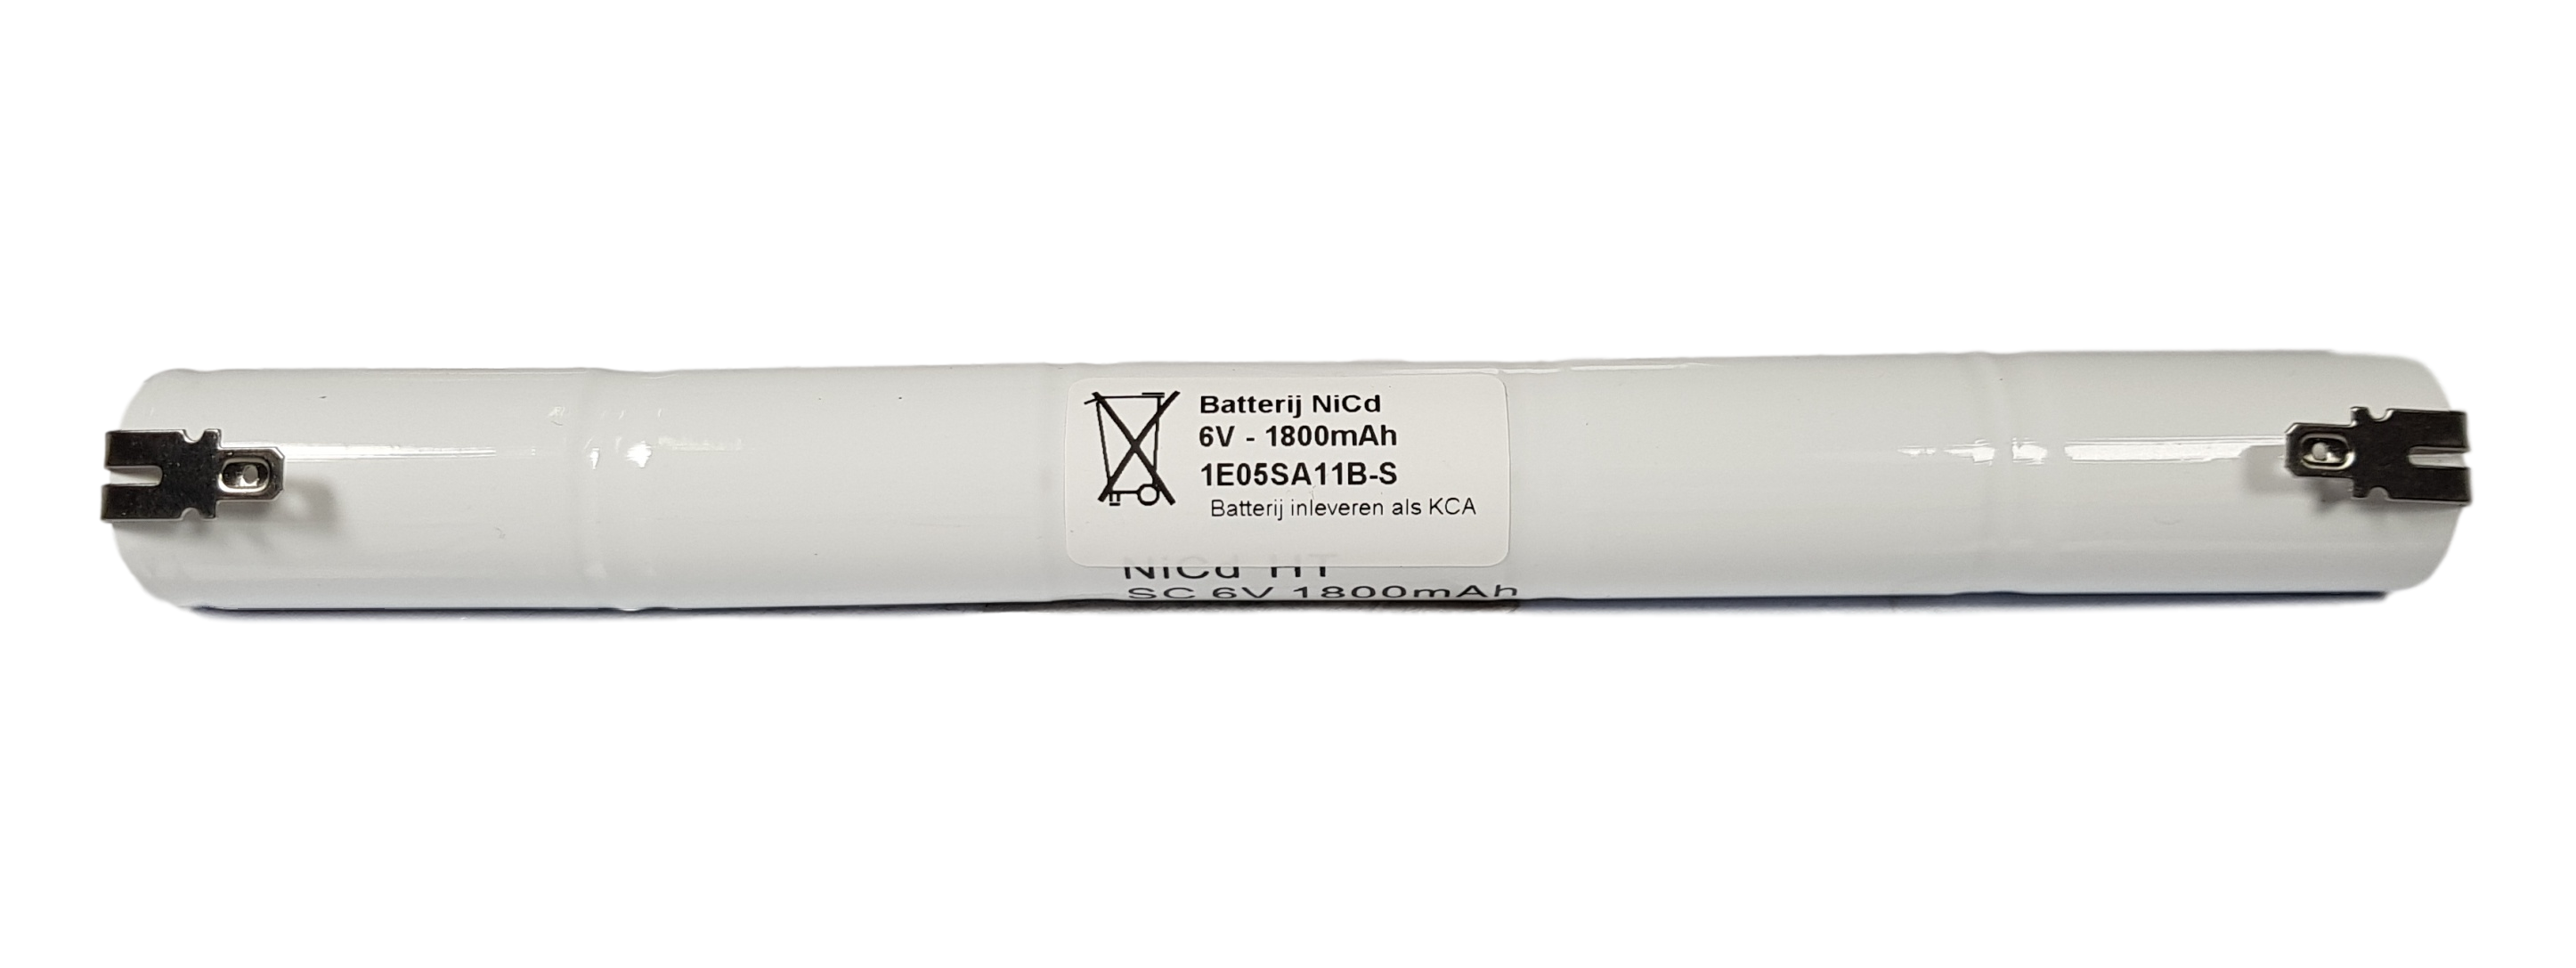 Noodverlichting accu NiCd 6V 1800mAh Cs 5STAAF - Faston 4,8mm